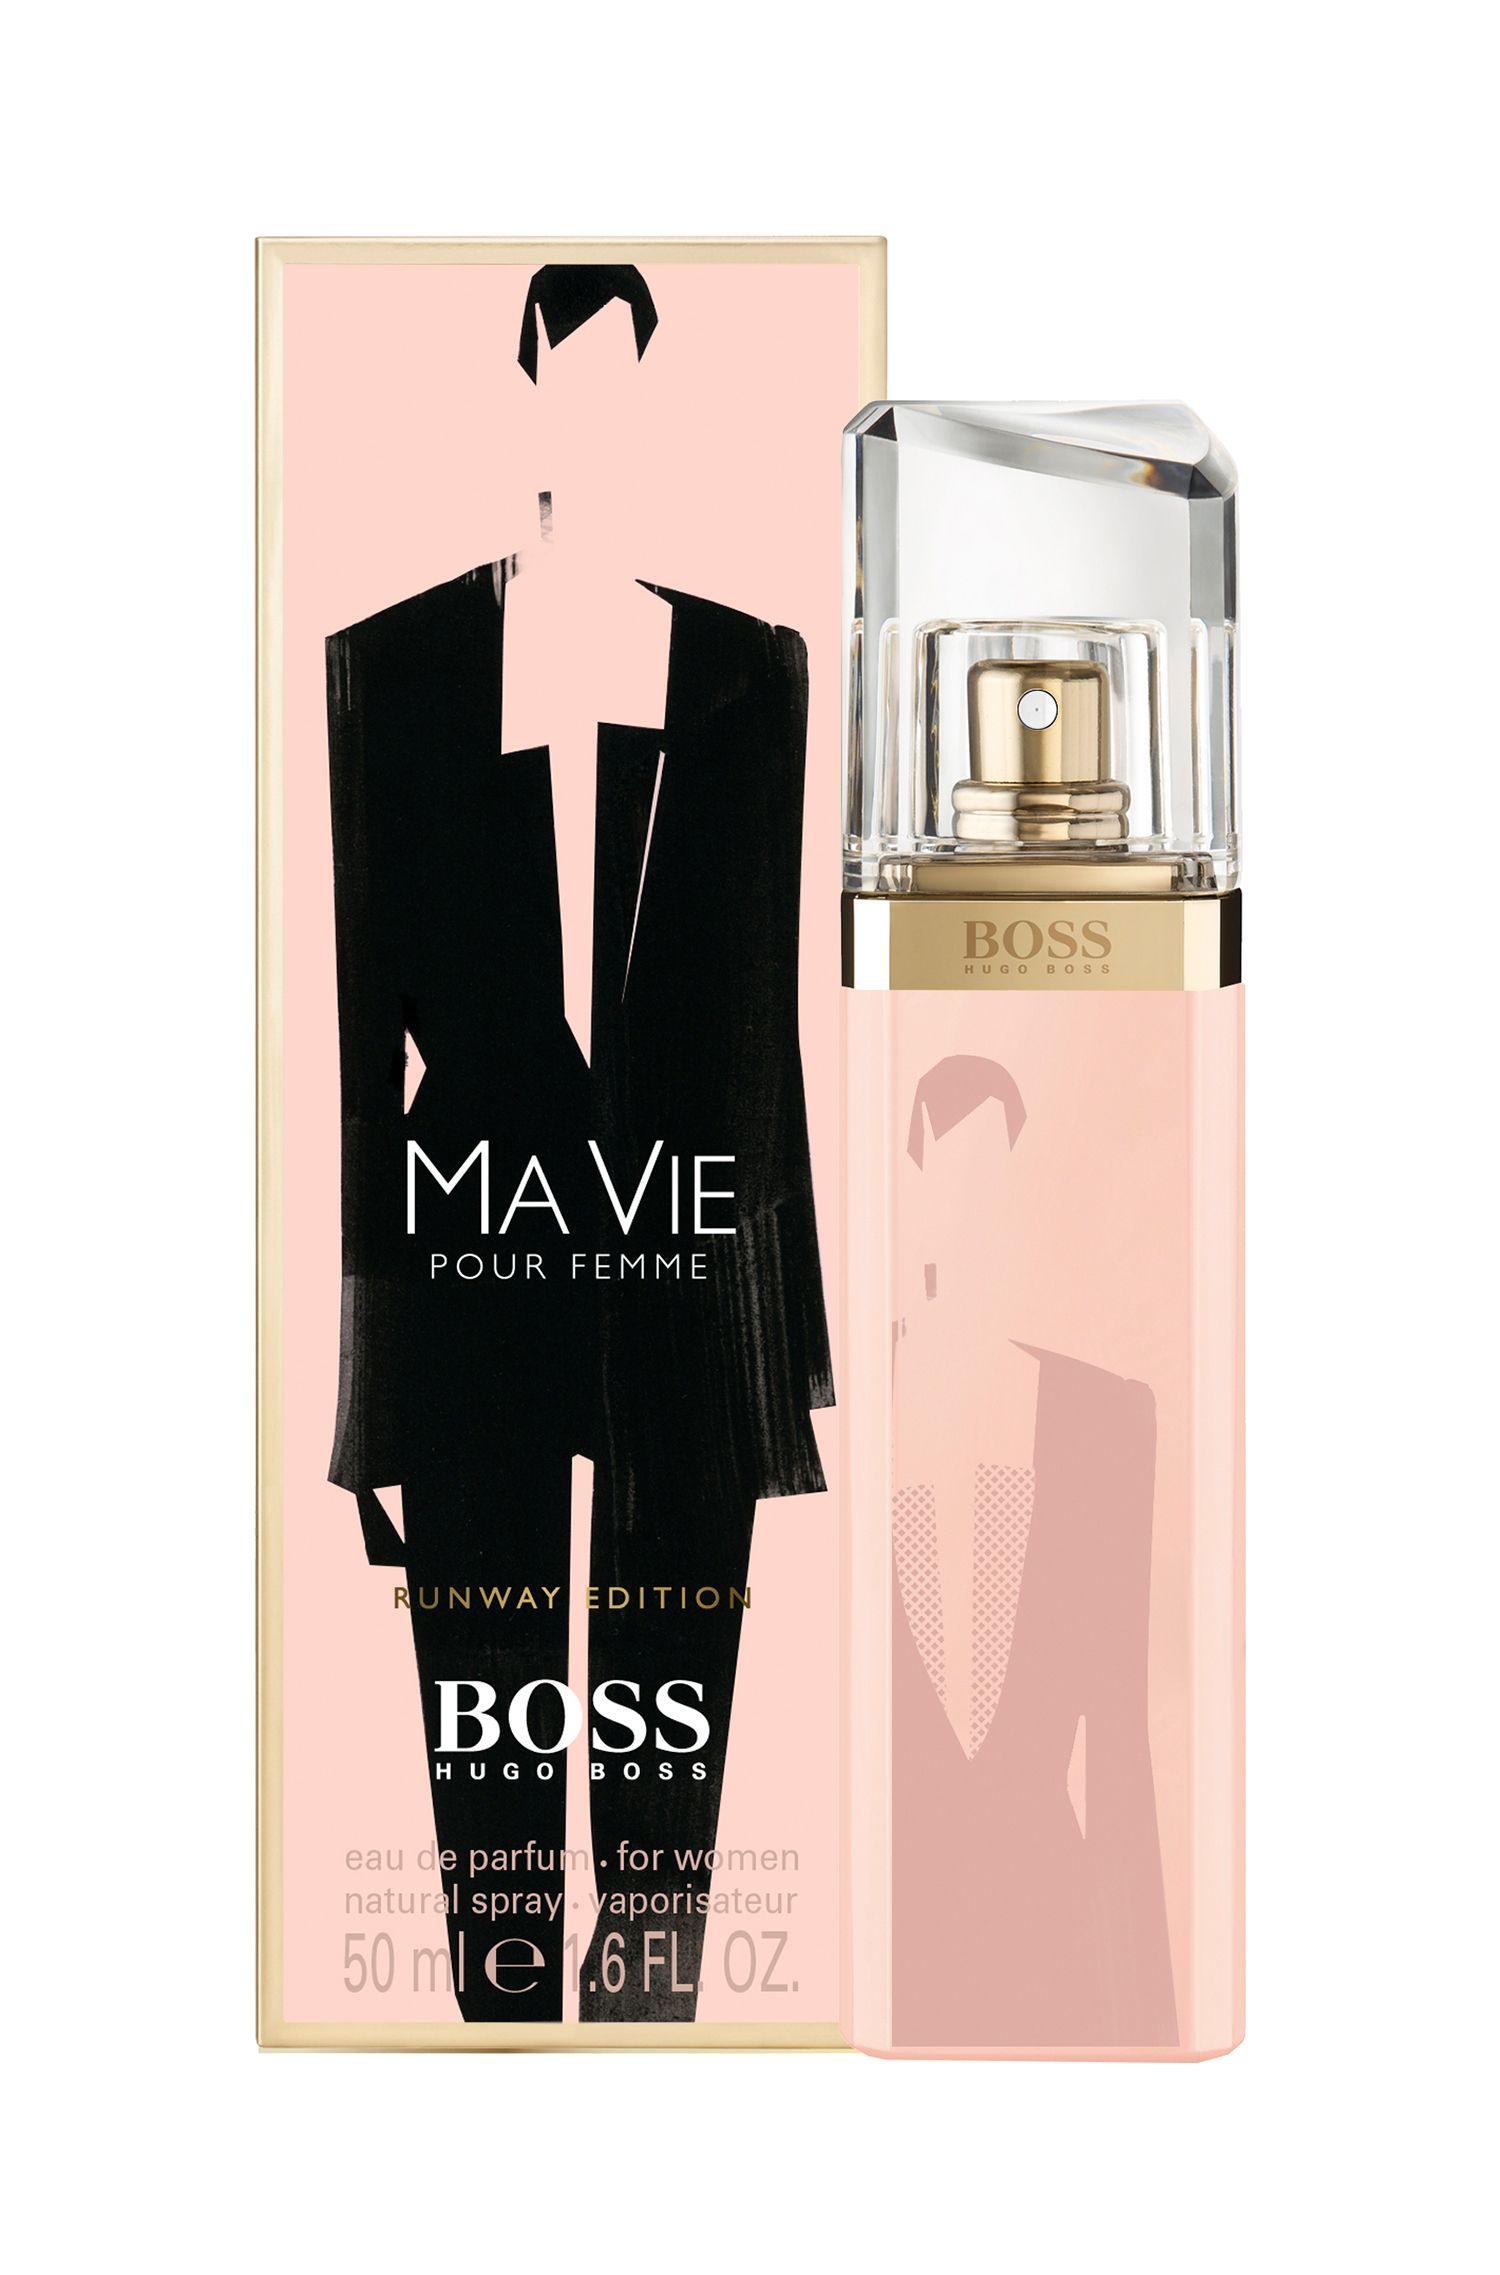 Boss Ma Vie Pour Femme Runway Edition Hugo Boss Perfume A